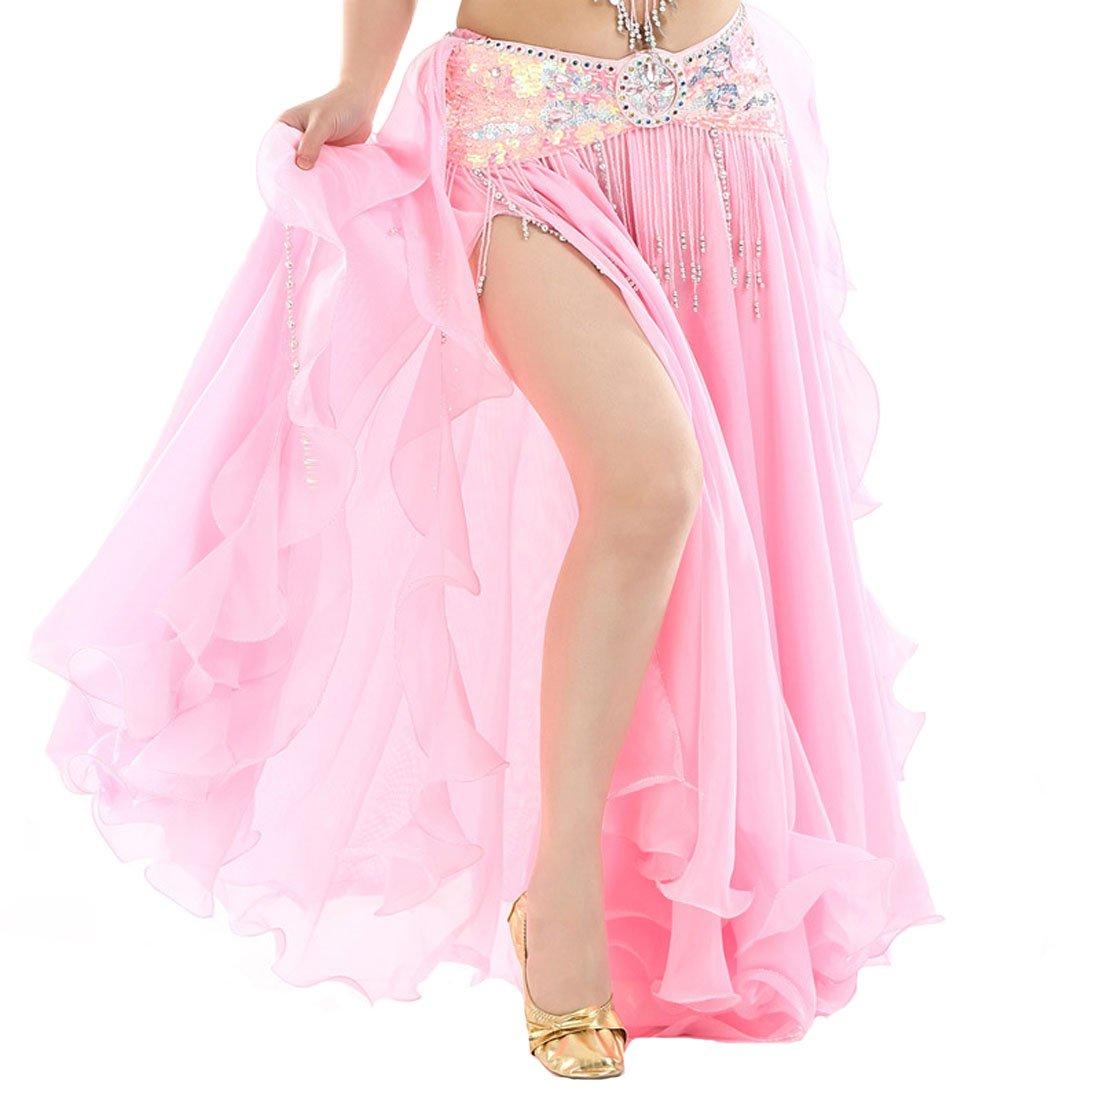 Calcifer Elegant Chiffon Curling Belly Dance Skirt Costume High-Split Dancing Dress For Women Professional Dancer